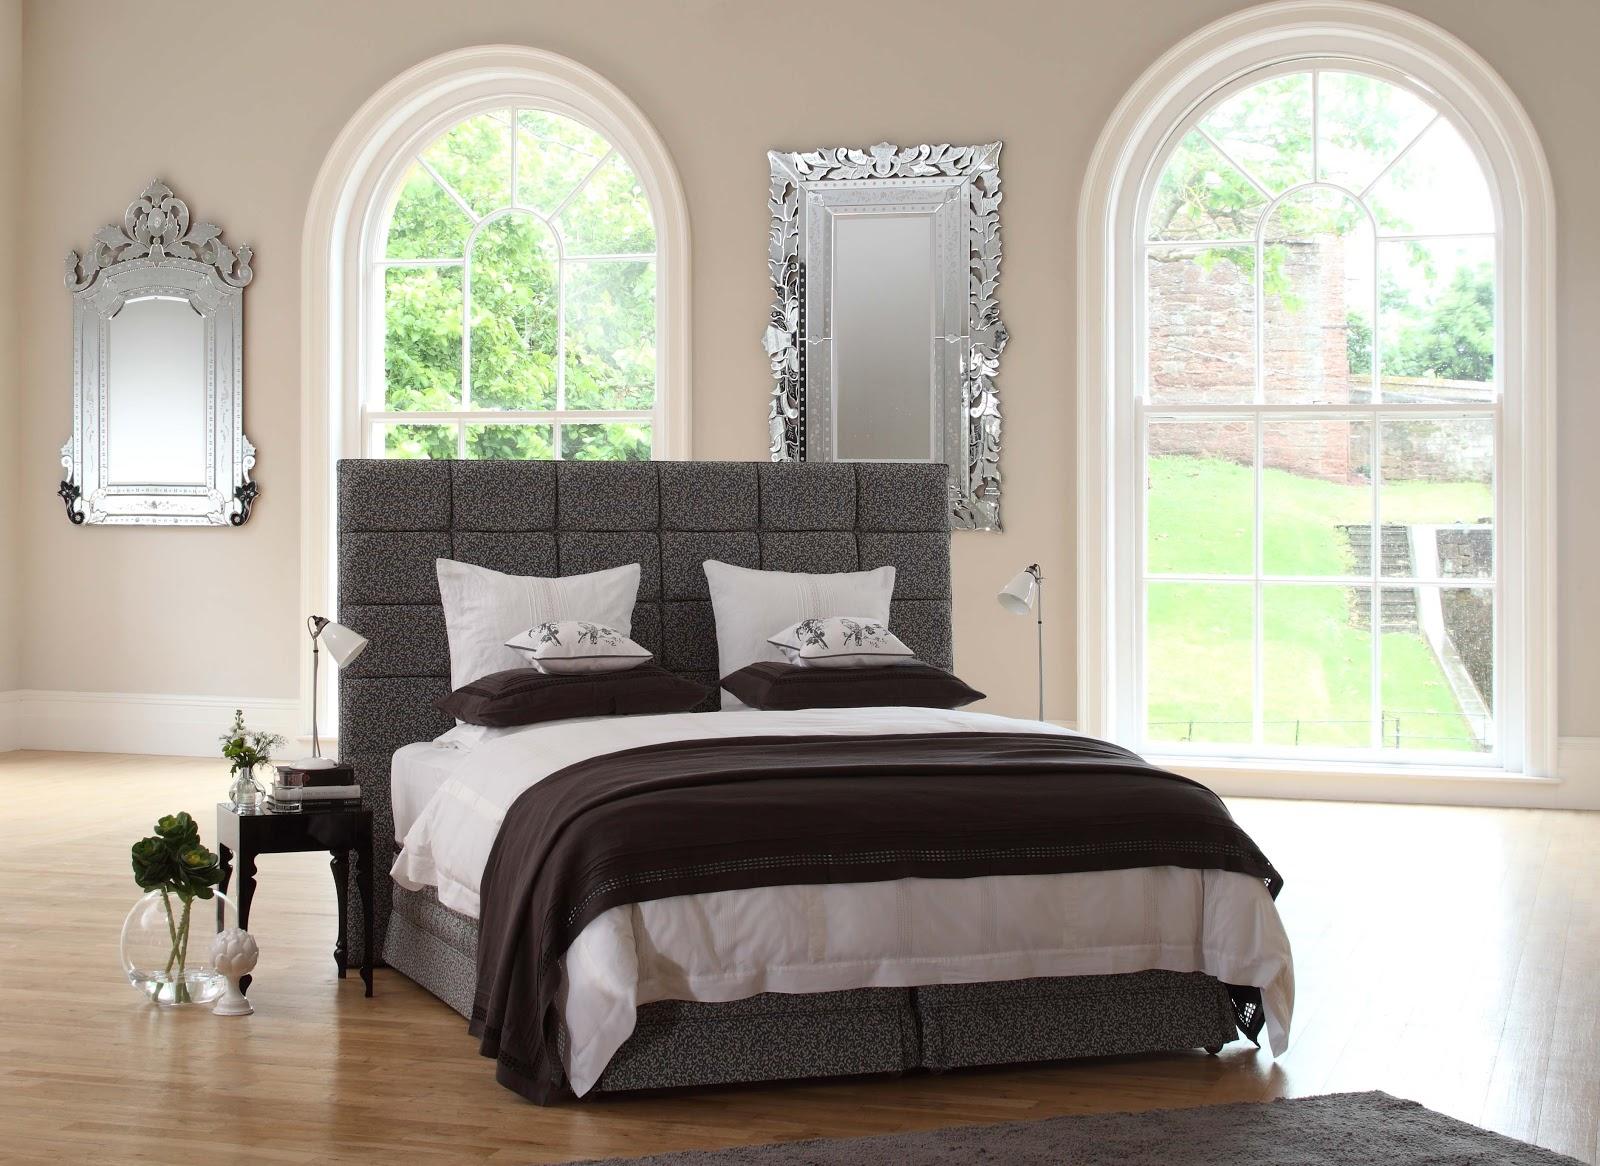 Cranleigh Bed With Bianca Lorenne Joshua 39 S Dream Bedding